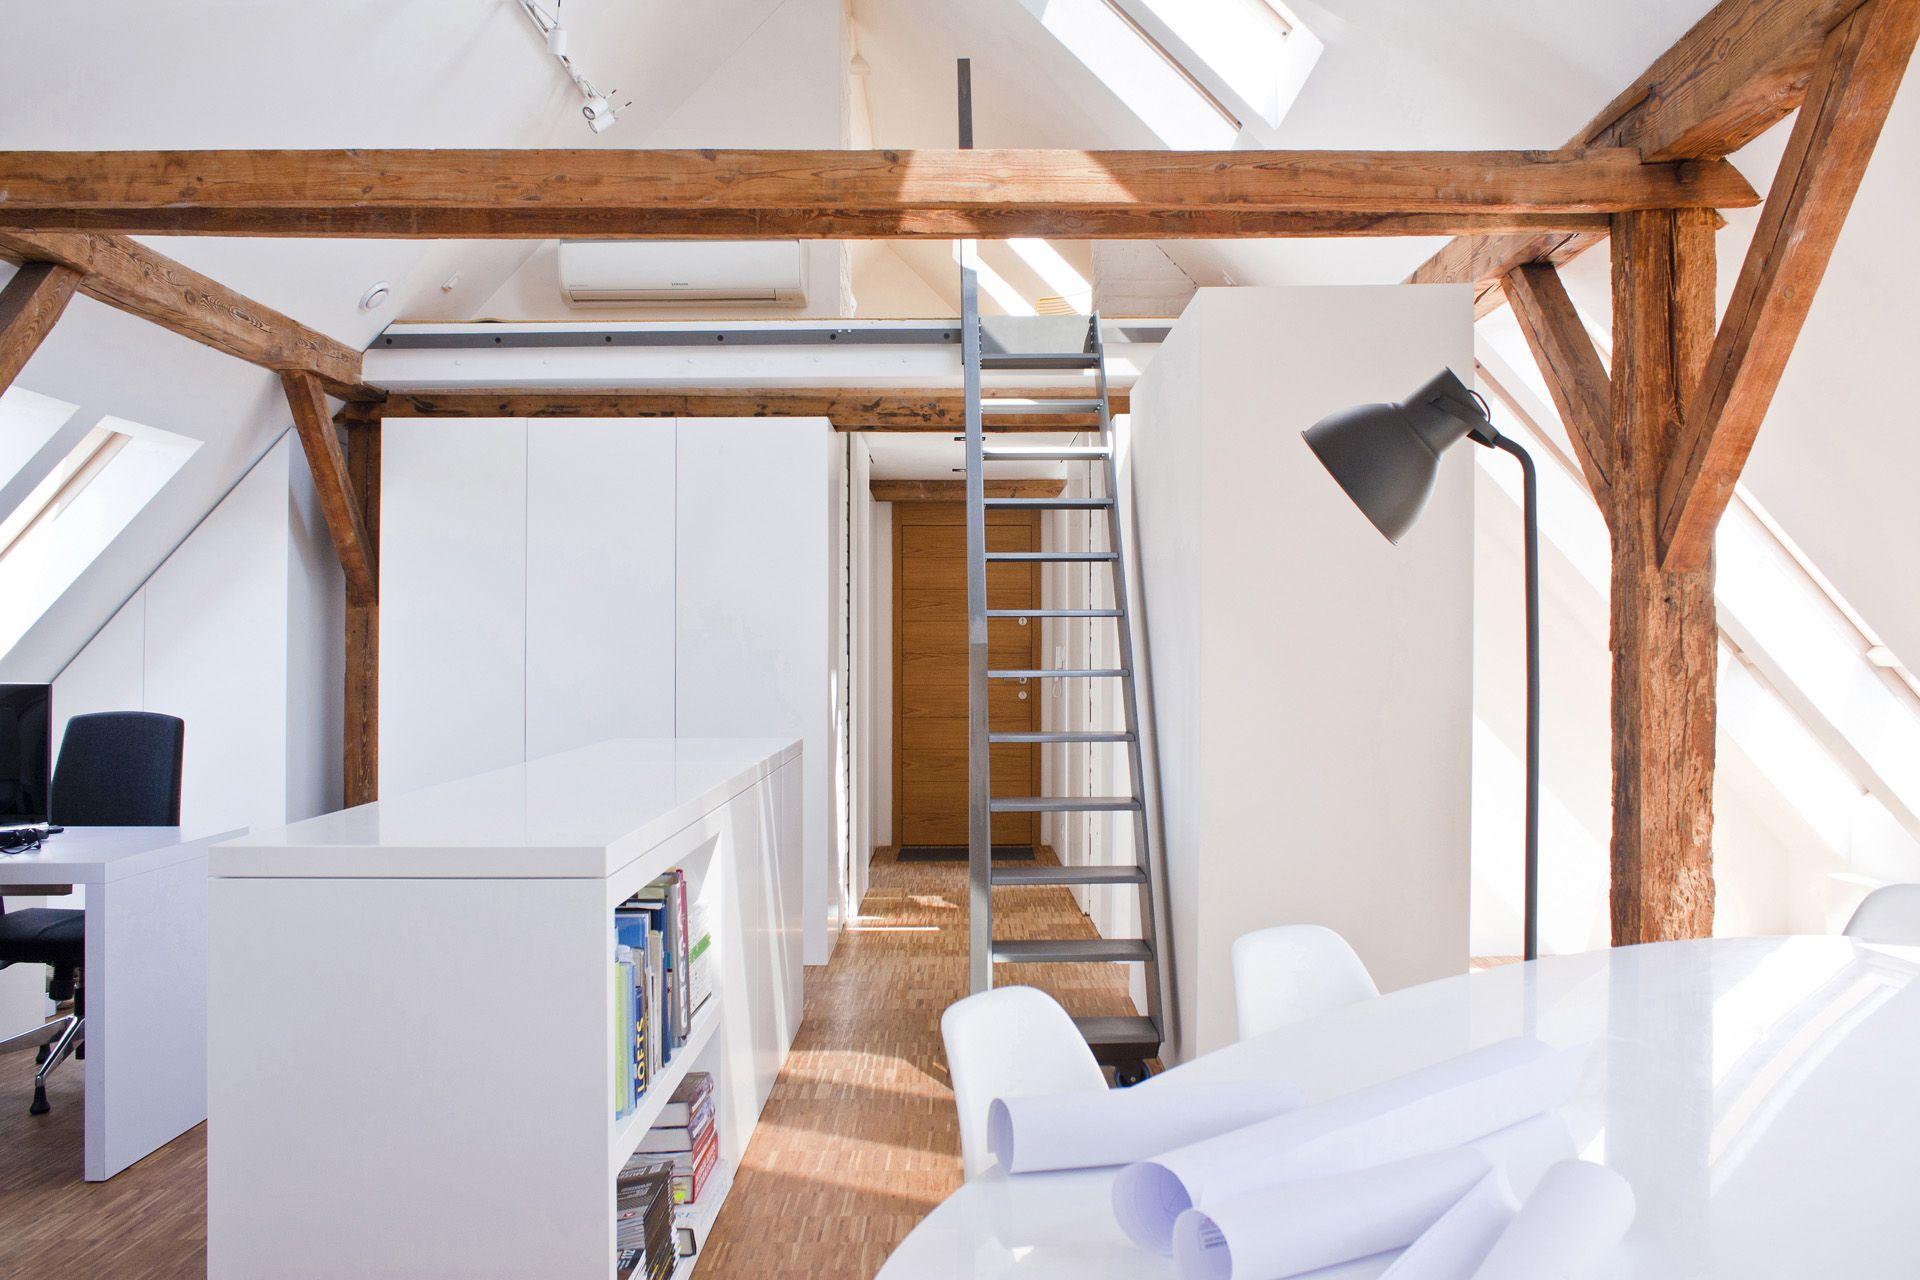 PL.architekci - Project - Design studio Poznan